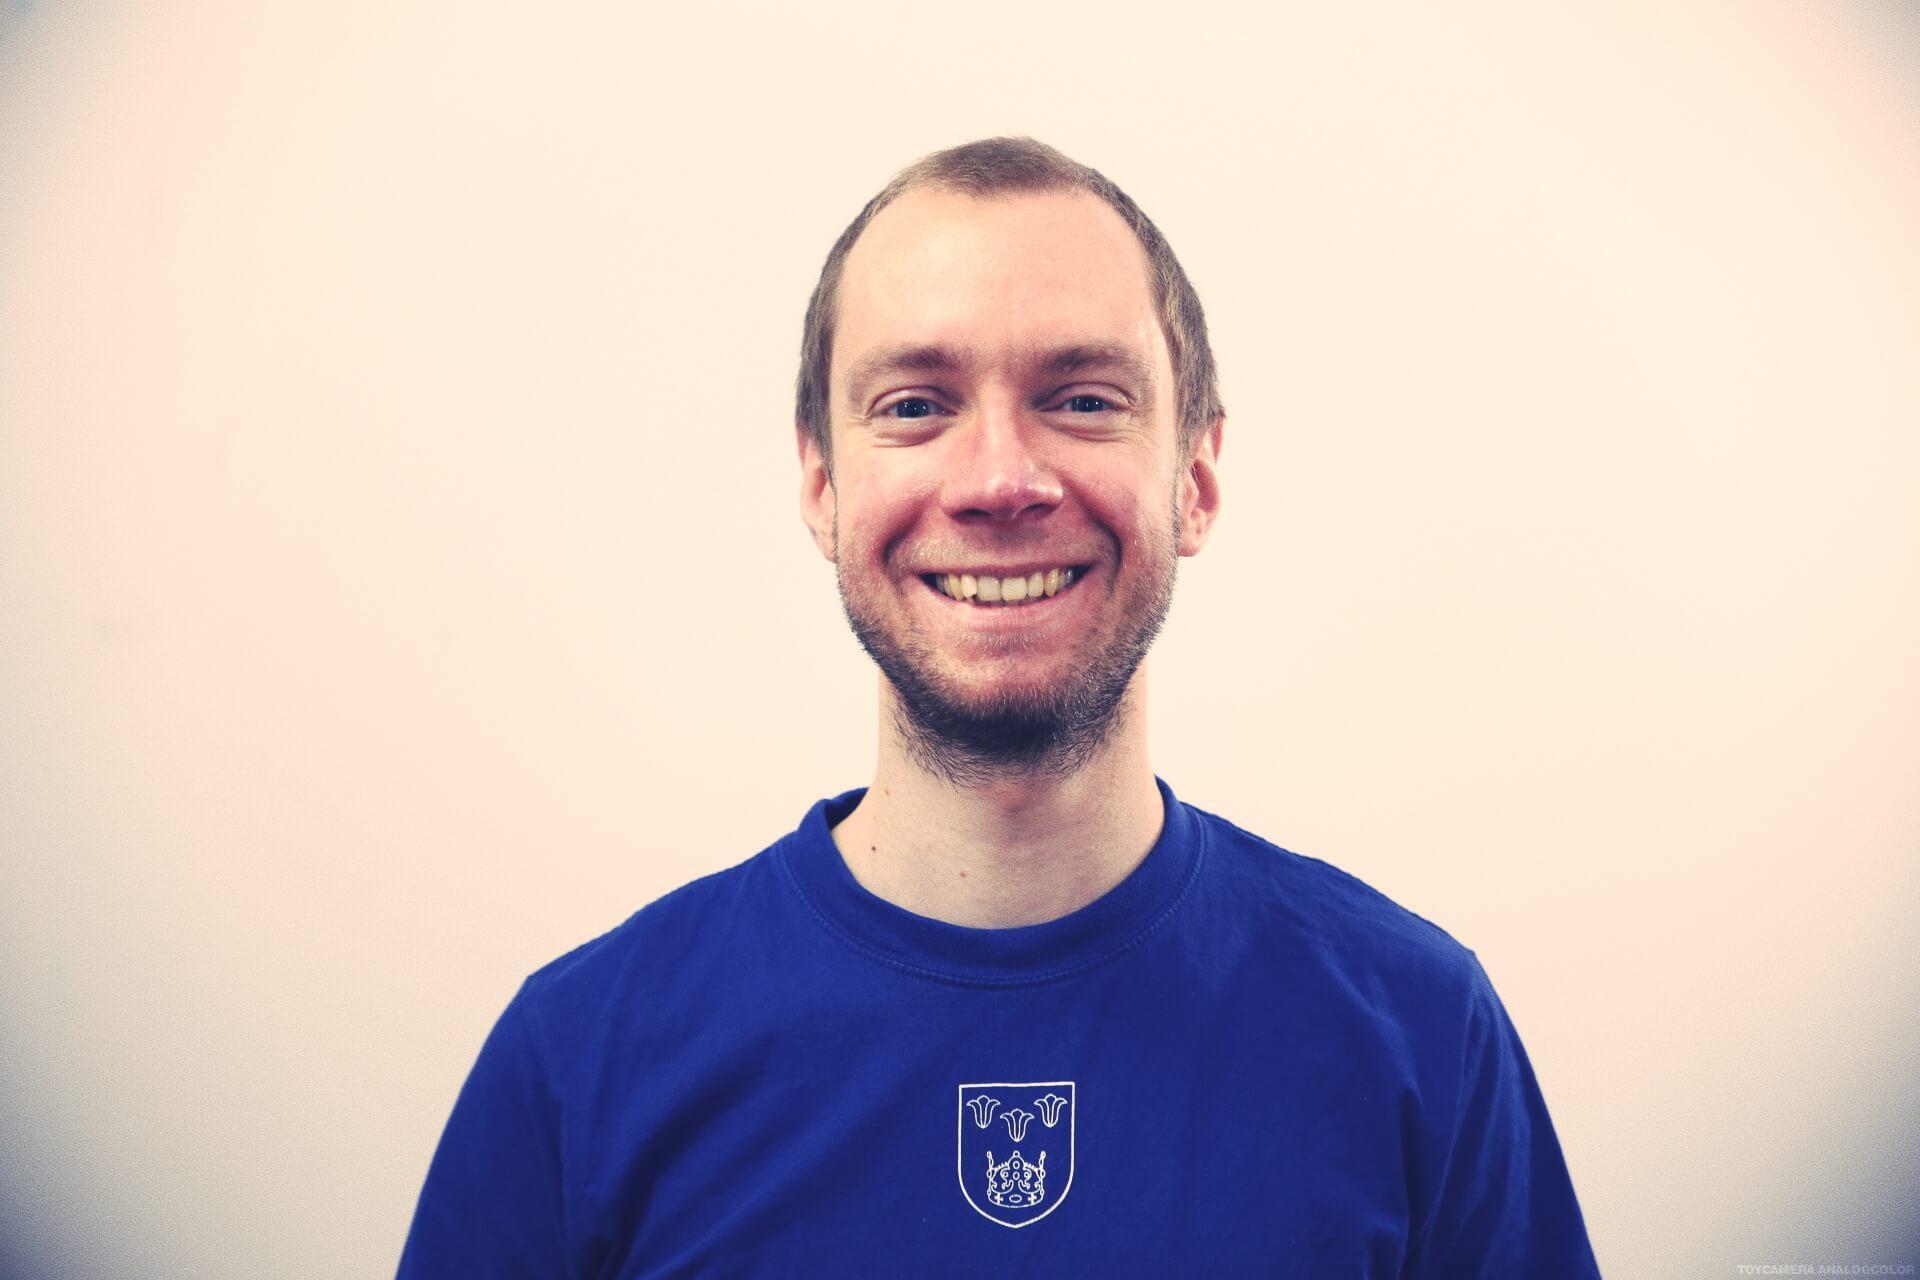 Petr - Danish Folk high school teacher at International People's College